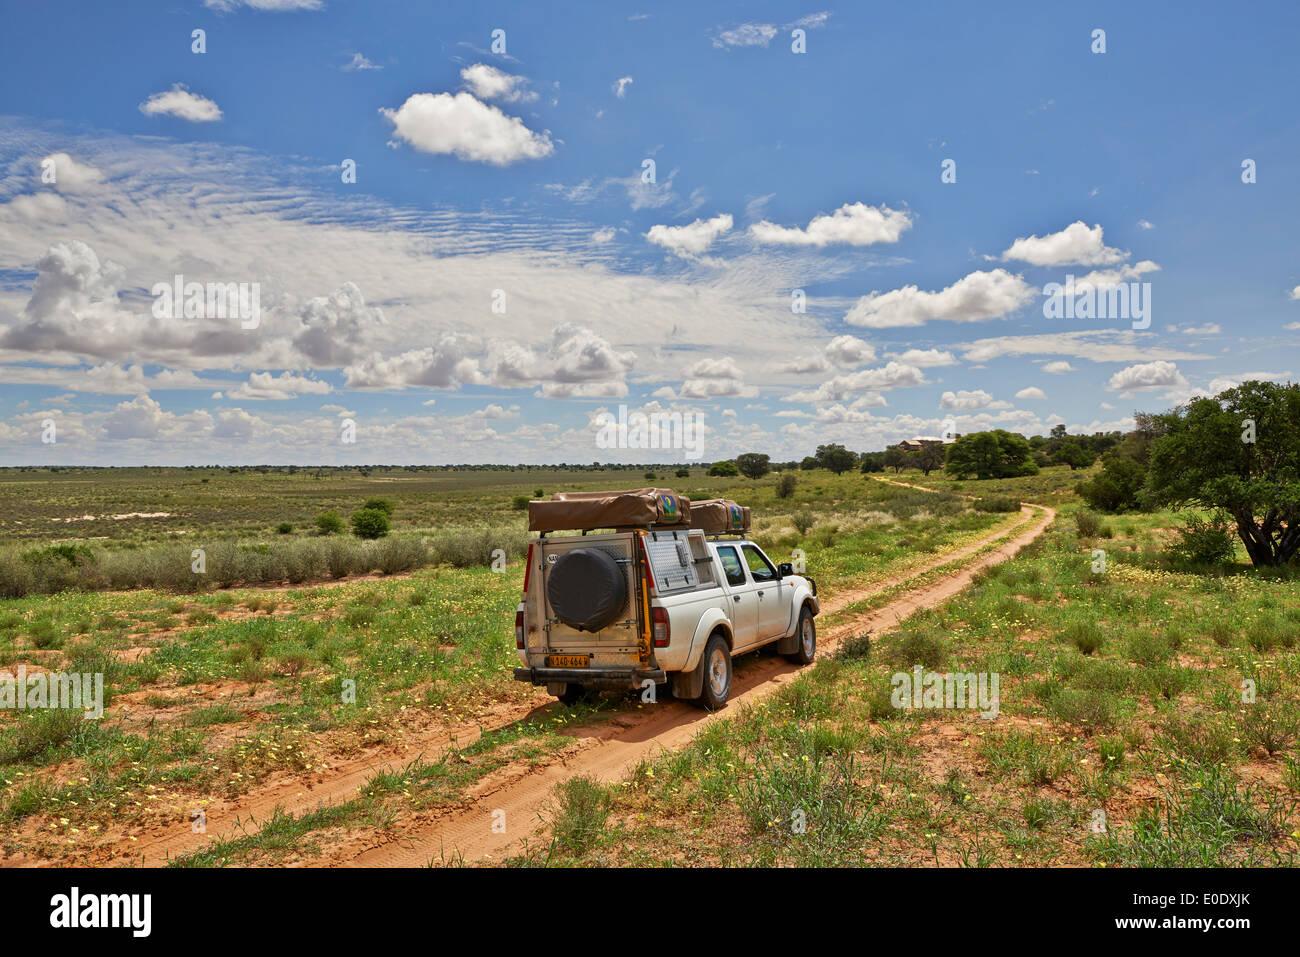 4x4 on the way to Polentswa Lodge in landscape of Kgalagadi Transfrontier Park, Kalahari, South Africa, Botswana, Africa - Stock Image